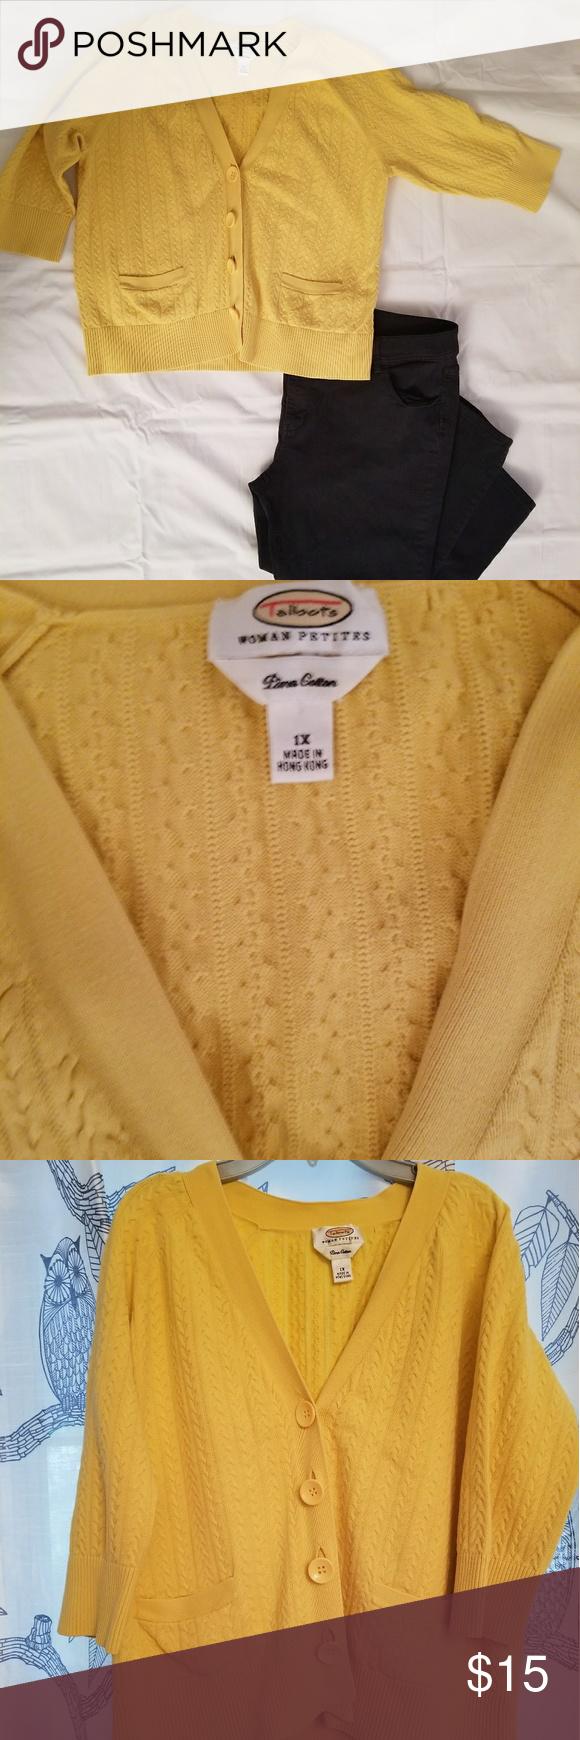 Talbot Woman Petite 1x Yellow Cardigan   Yellow cardigan, Talbots ...